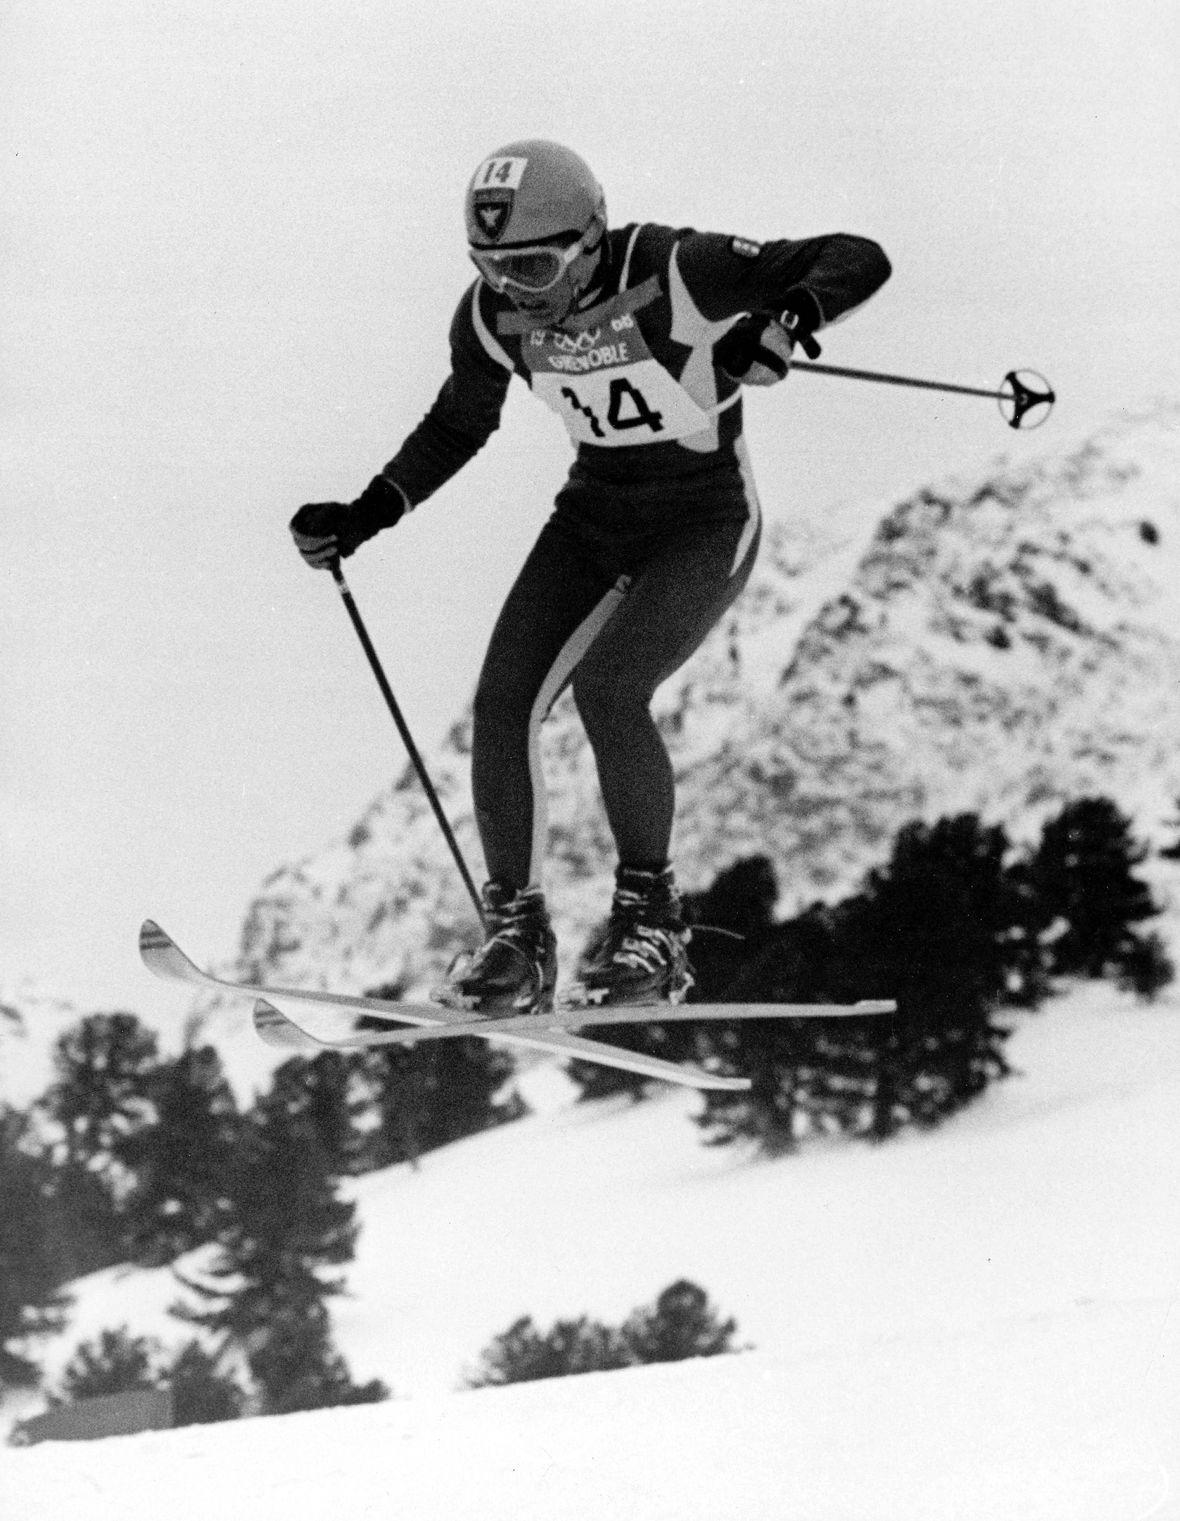 Ski Week Jean-Claude Killy Rolex Brand Ambassador